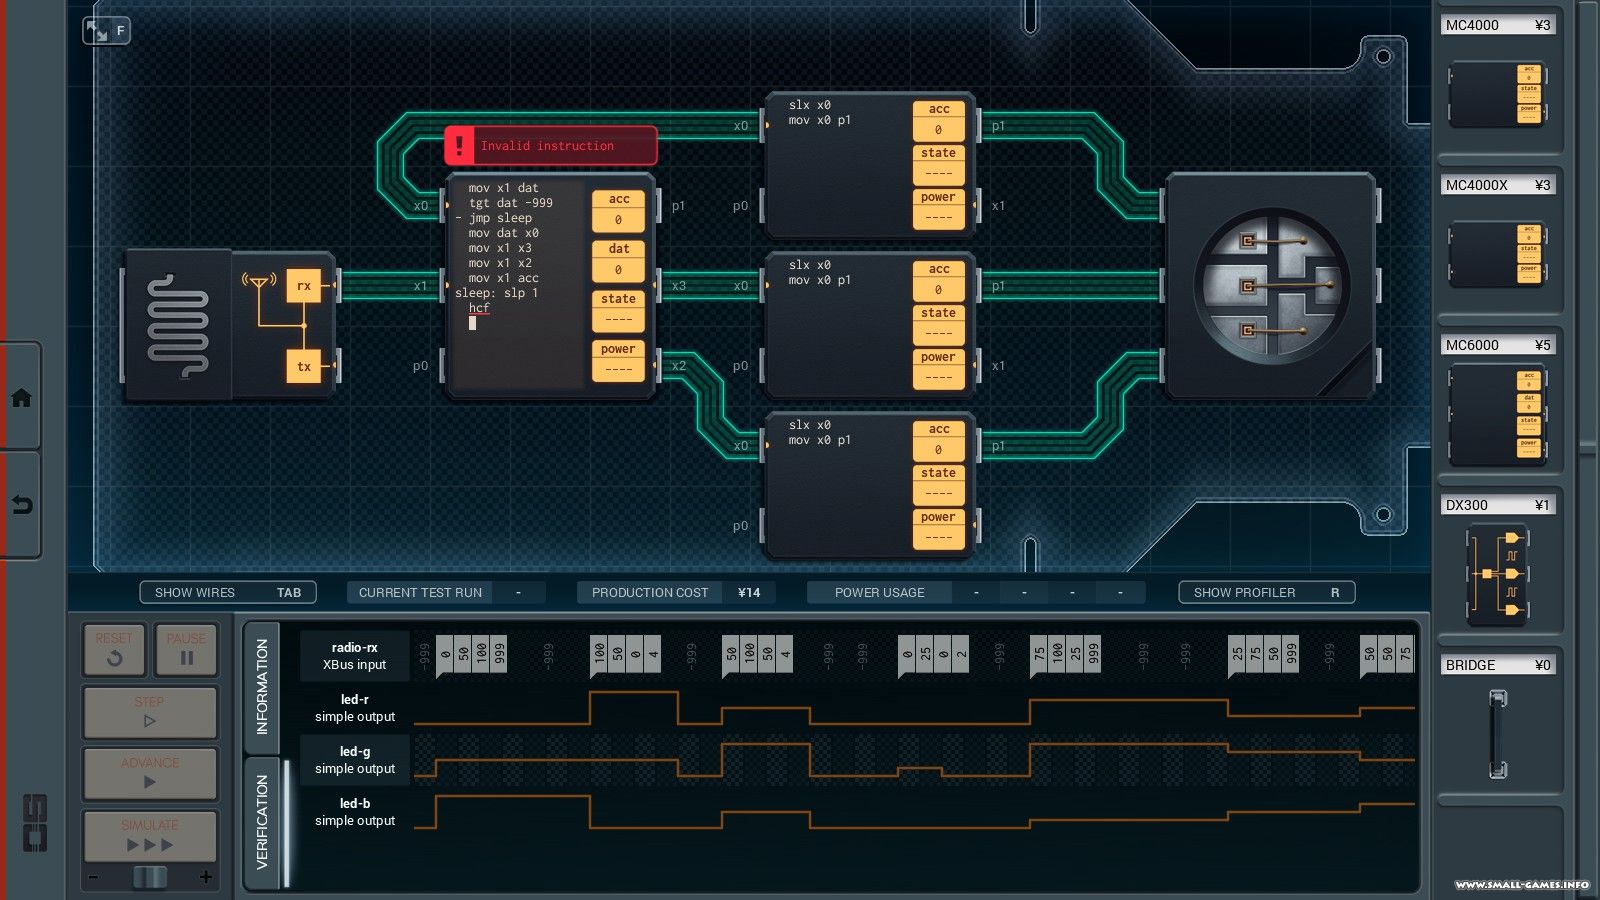 SHENZHEN I/O v1.4 / + GOG - торрент, скачать полную версию